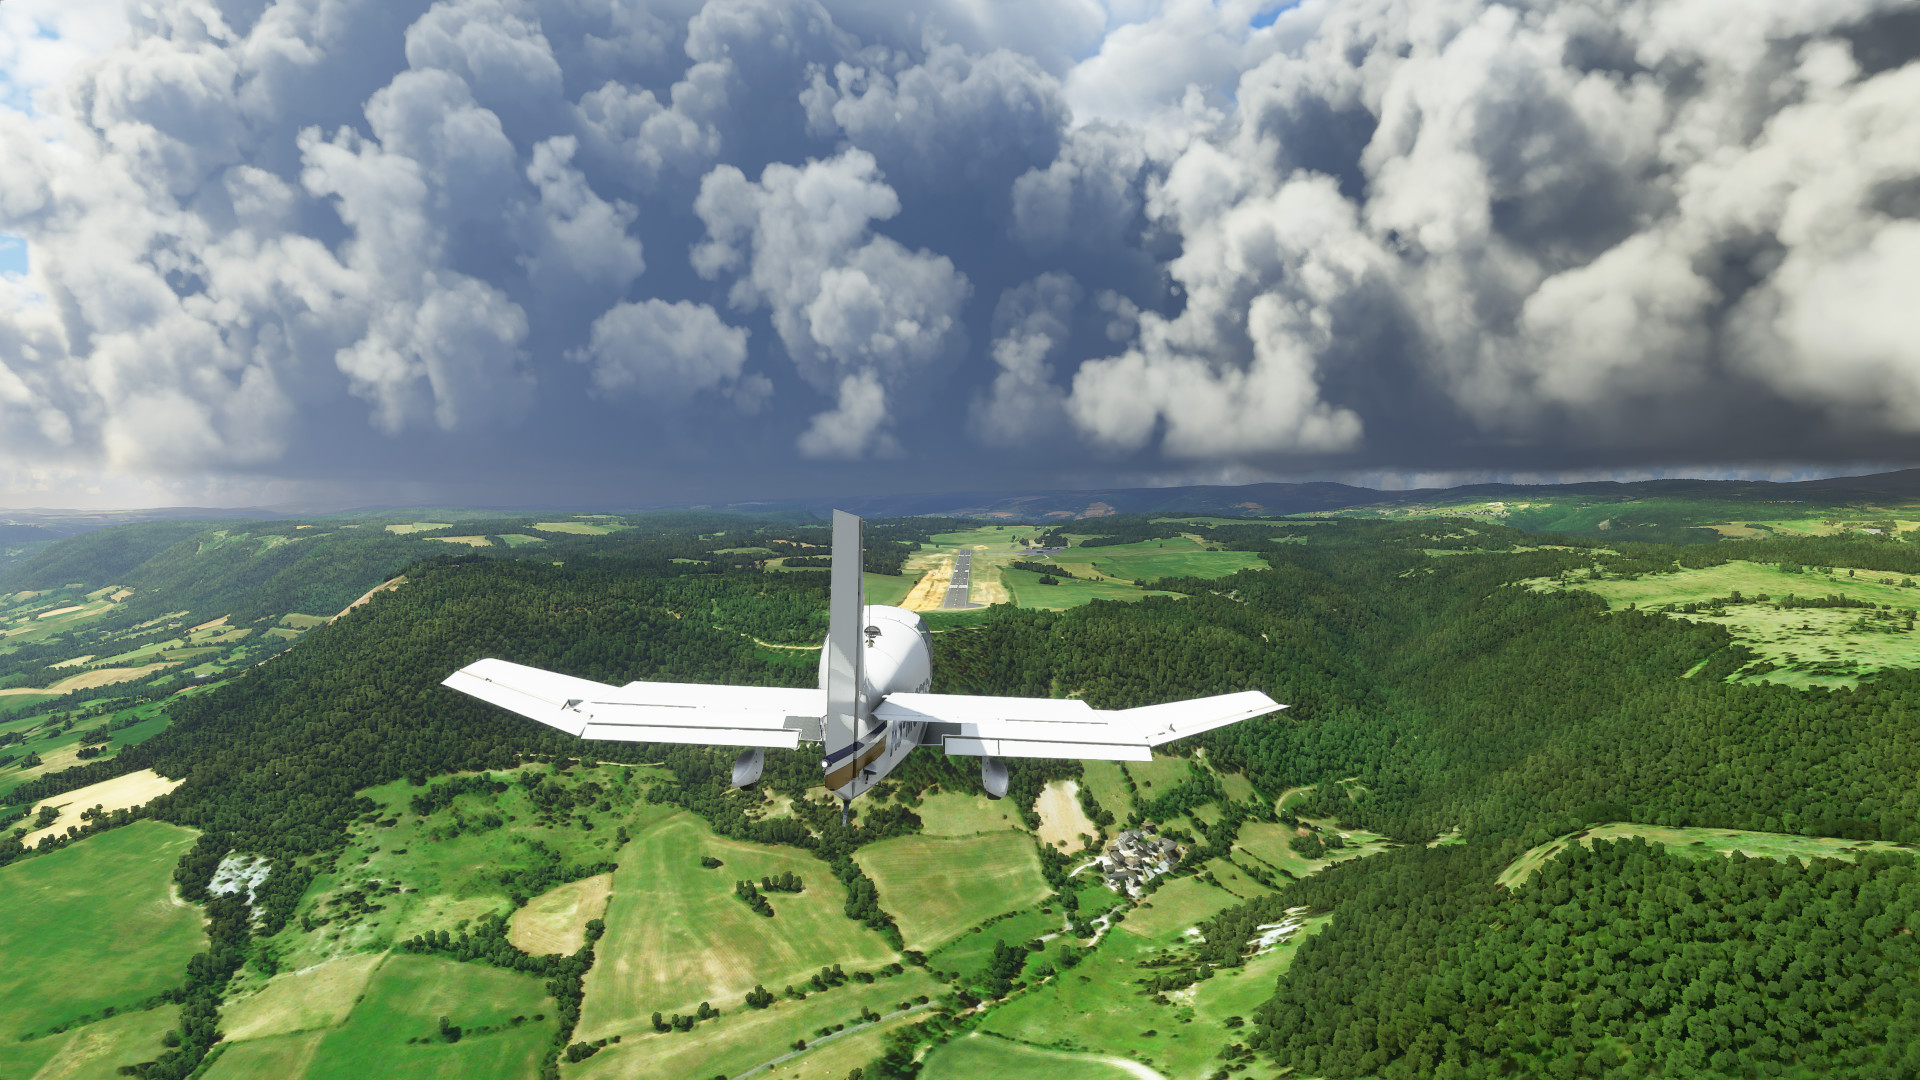 Microsoft Flight Simulator (2020) torrent download for PC